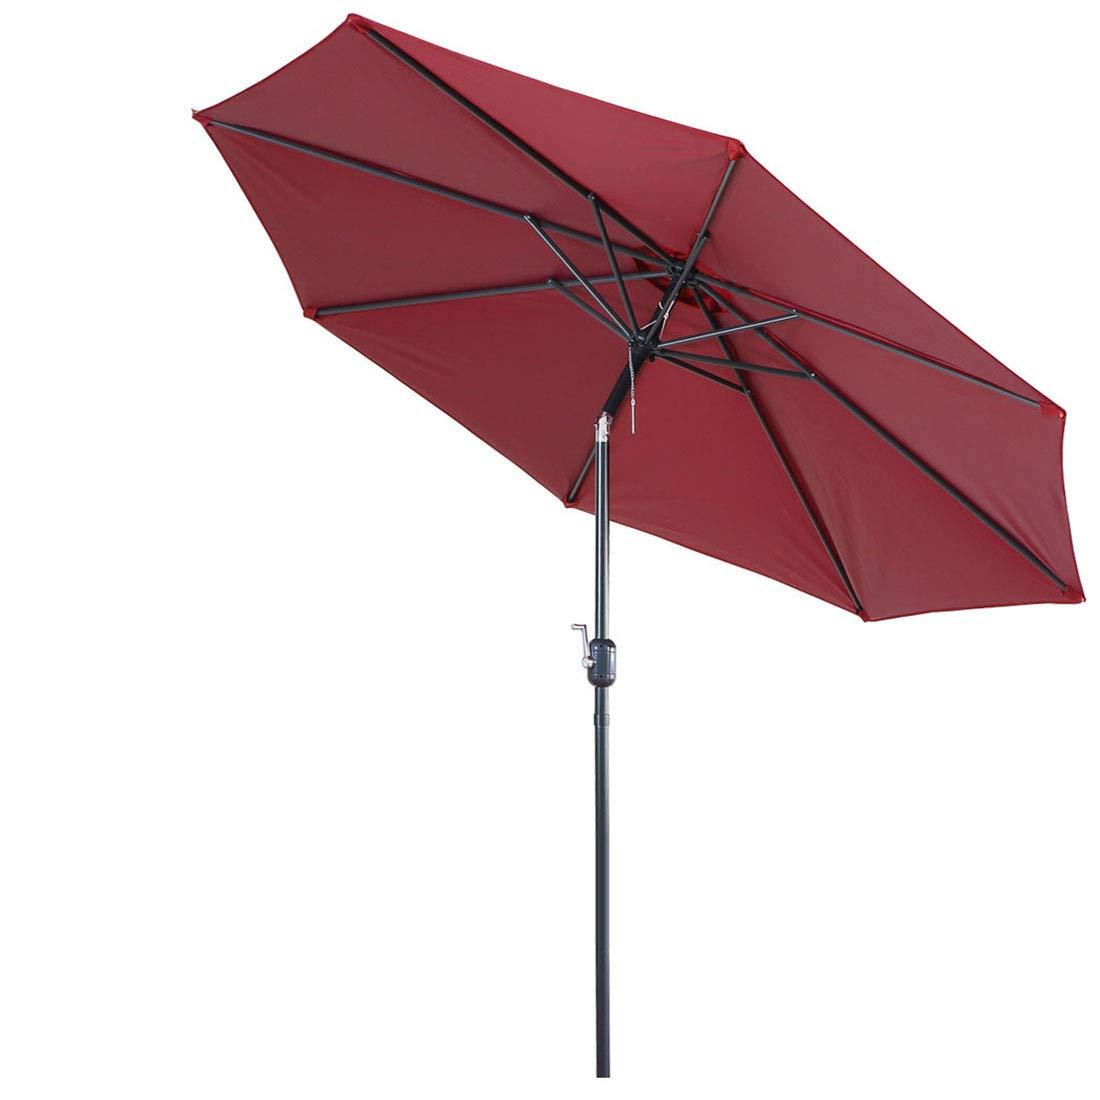 FARLAND Patio Umbrella 9 Ft Outdoor Table Aluminum Offset Market Umbrellas with Push Button Tilt and Crank